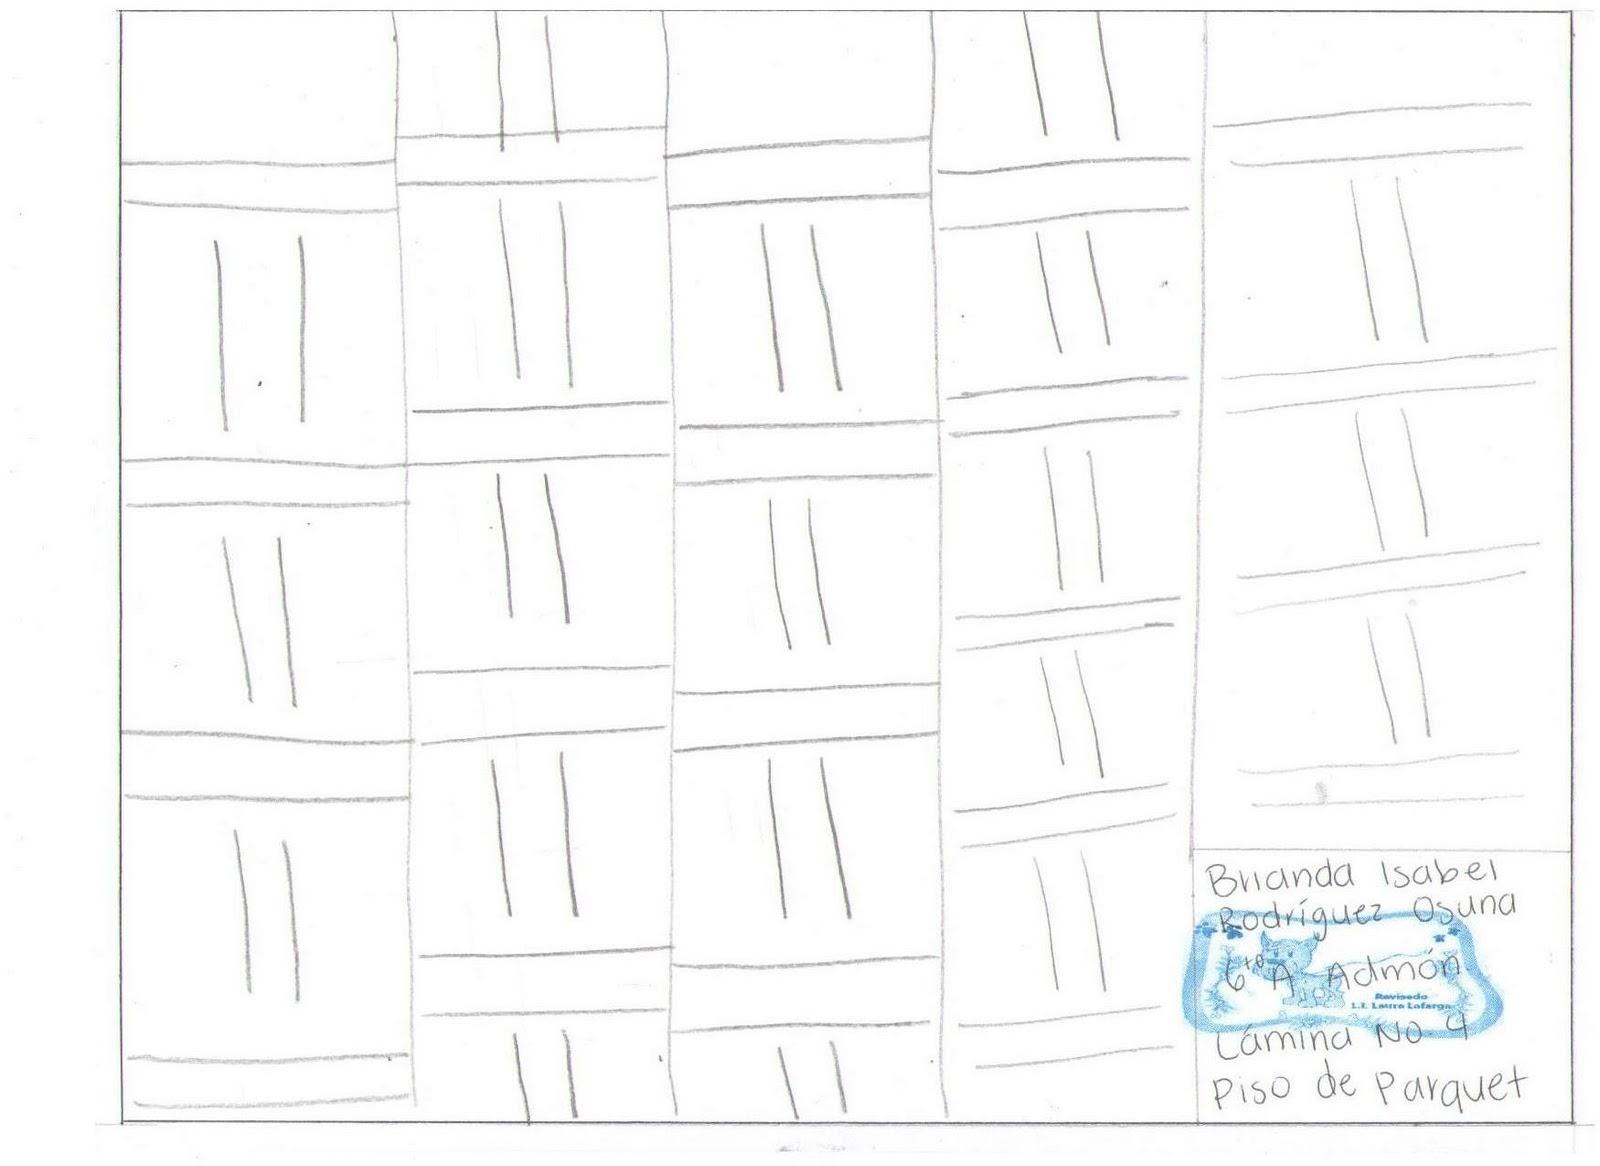 Dibujo t cnico l mina 4 piso de parquet - Laminas de parquet ...